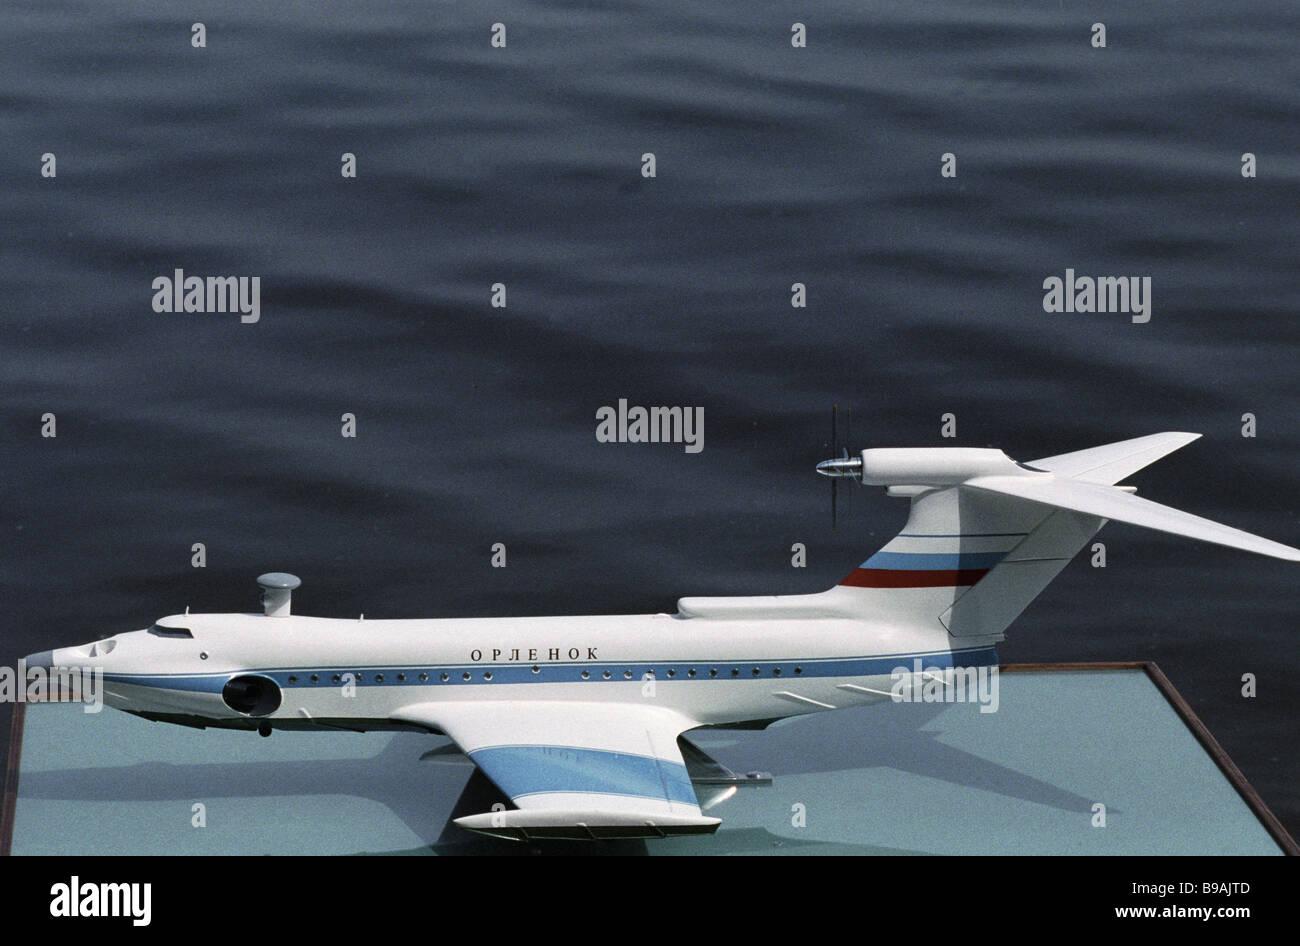 A model of the Orlenok wing in ground transport craft designed by the Alekseyev Design Bureau - Stock Image